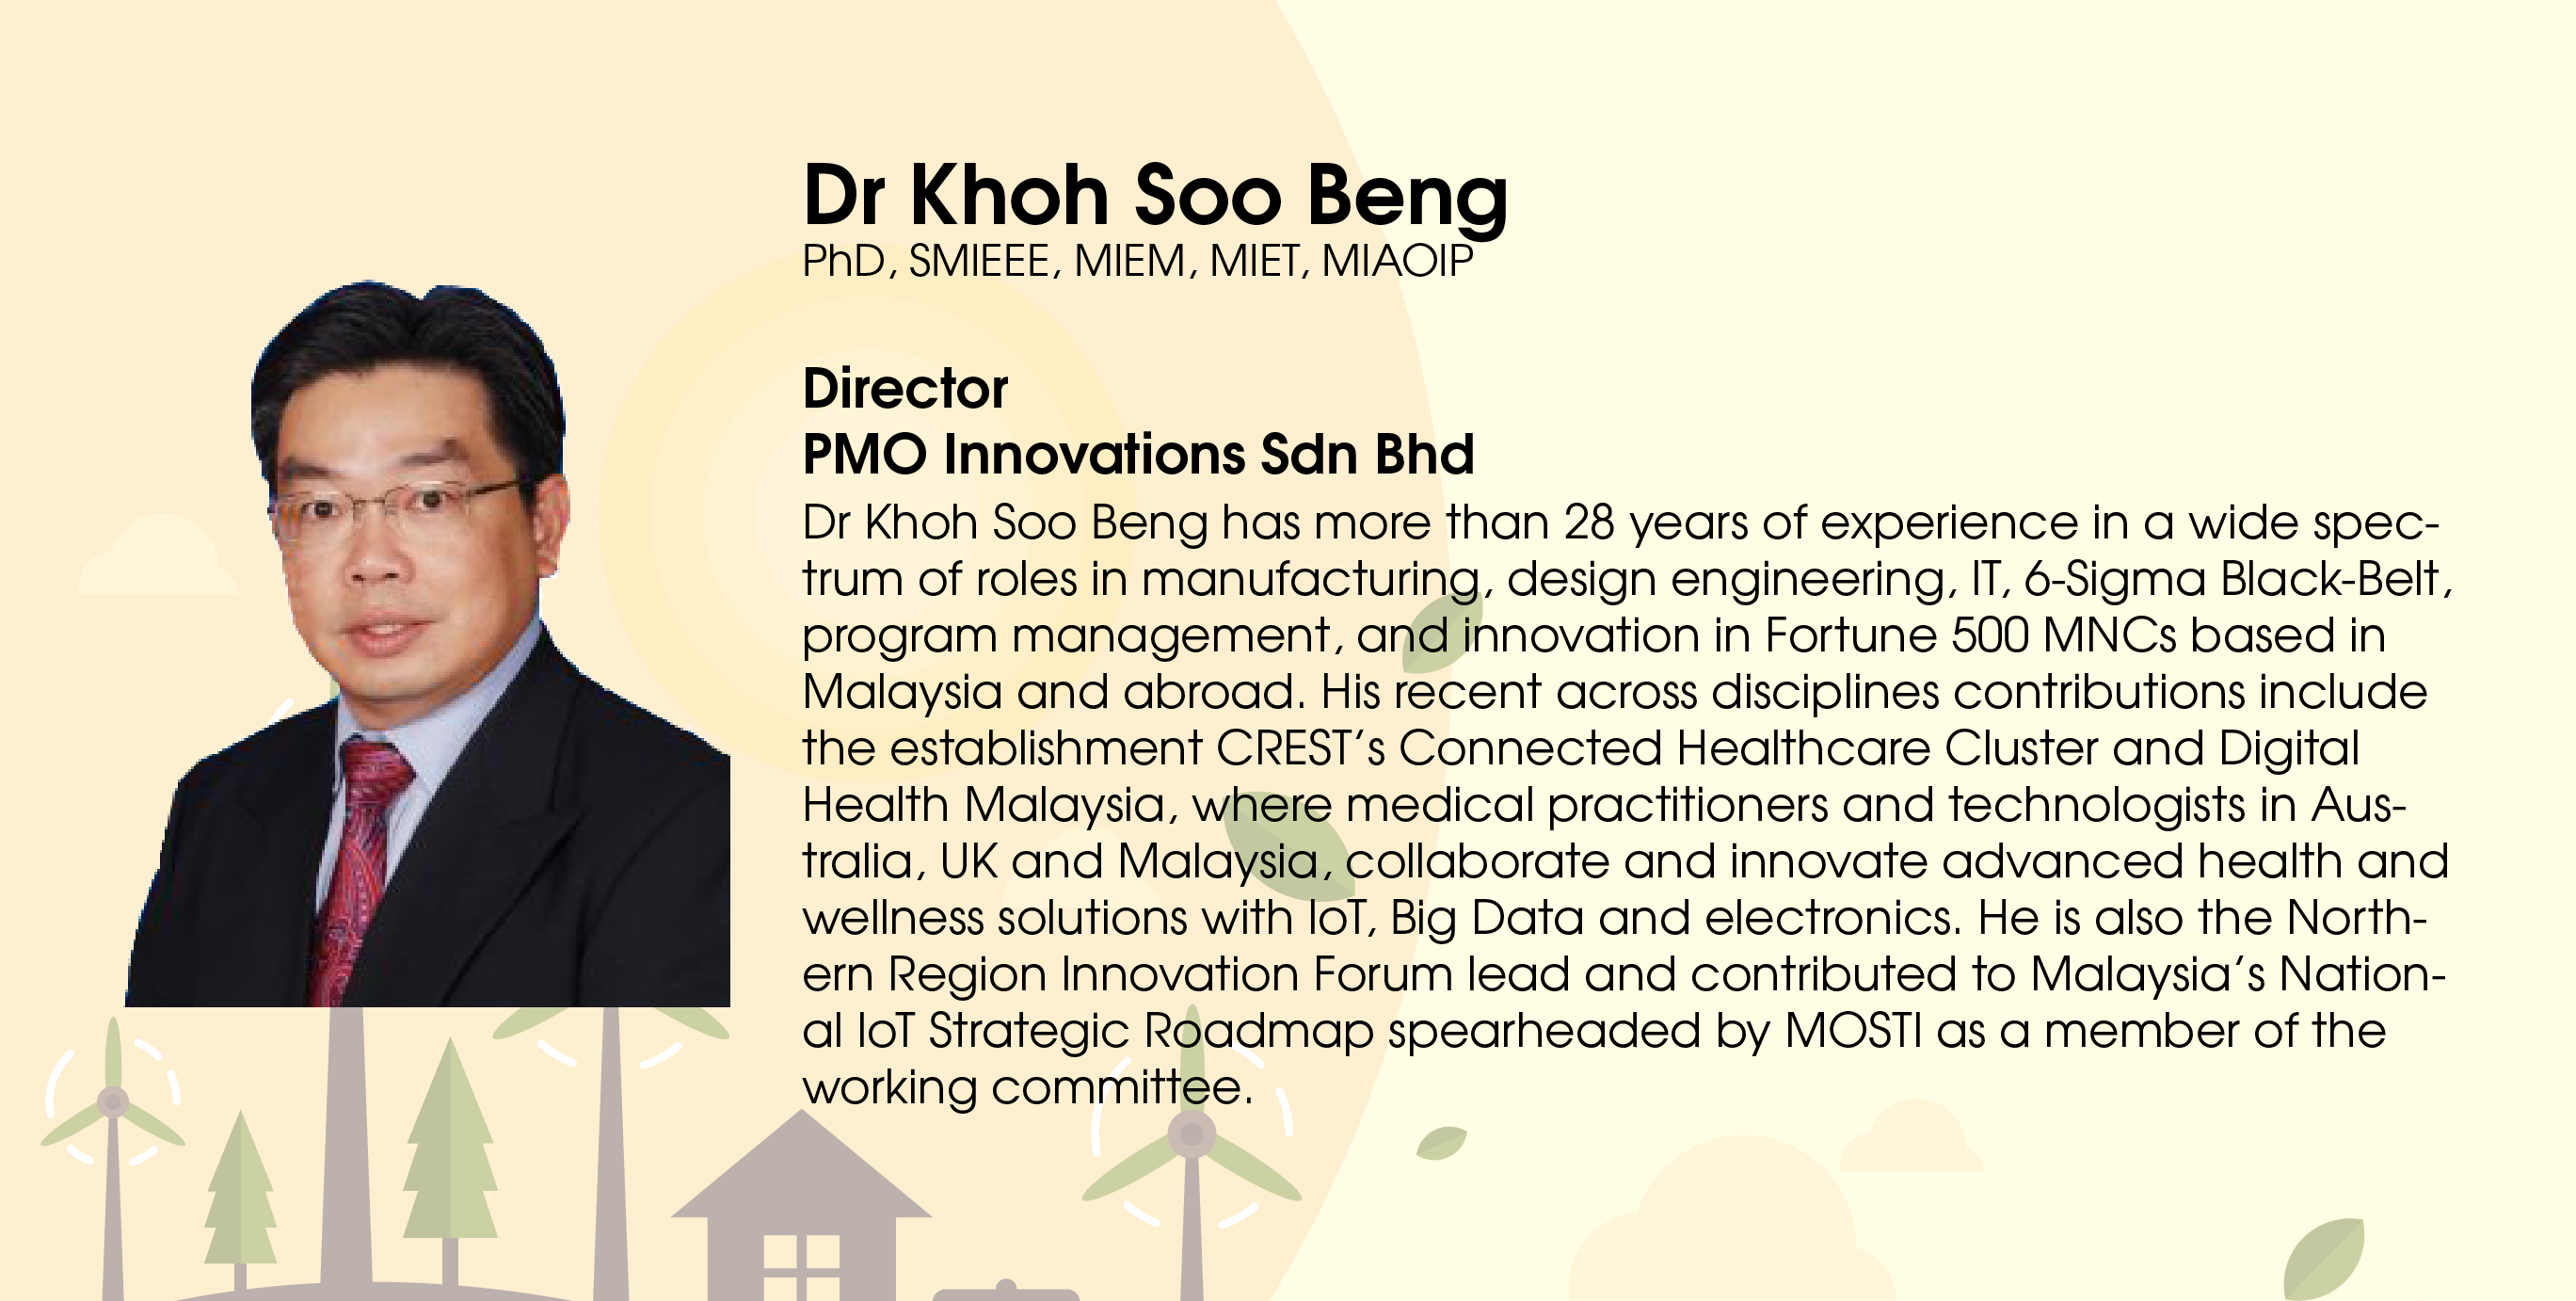 Dr Khoh